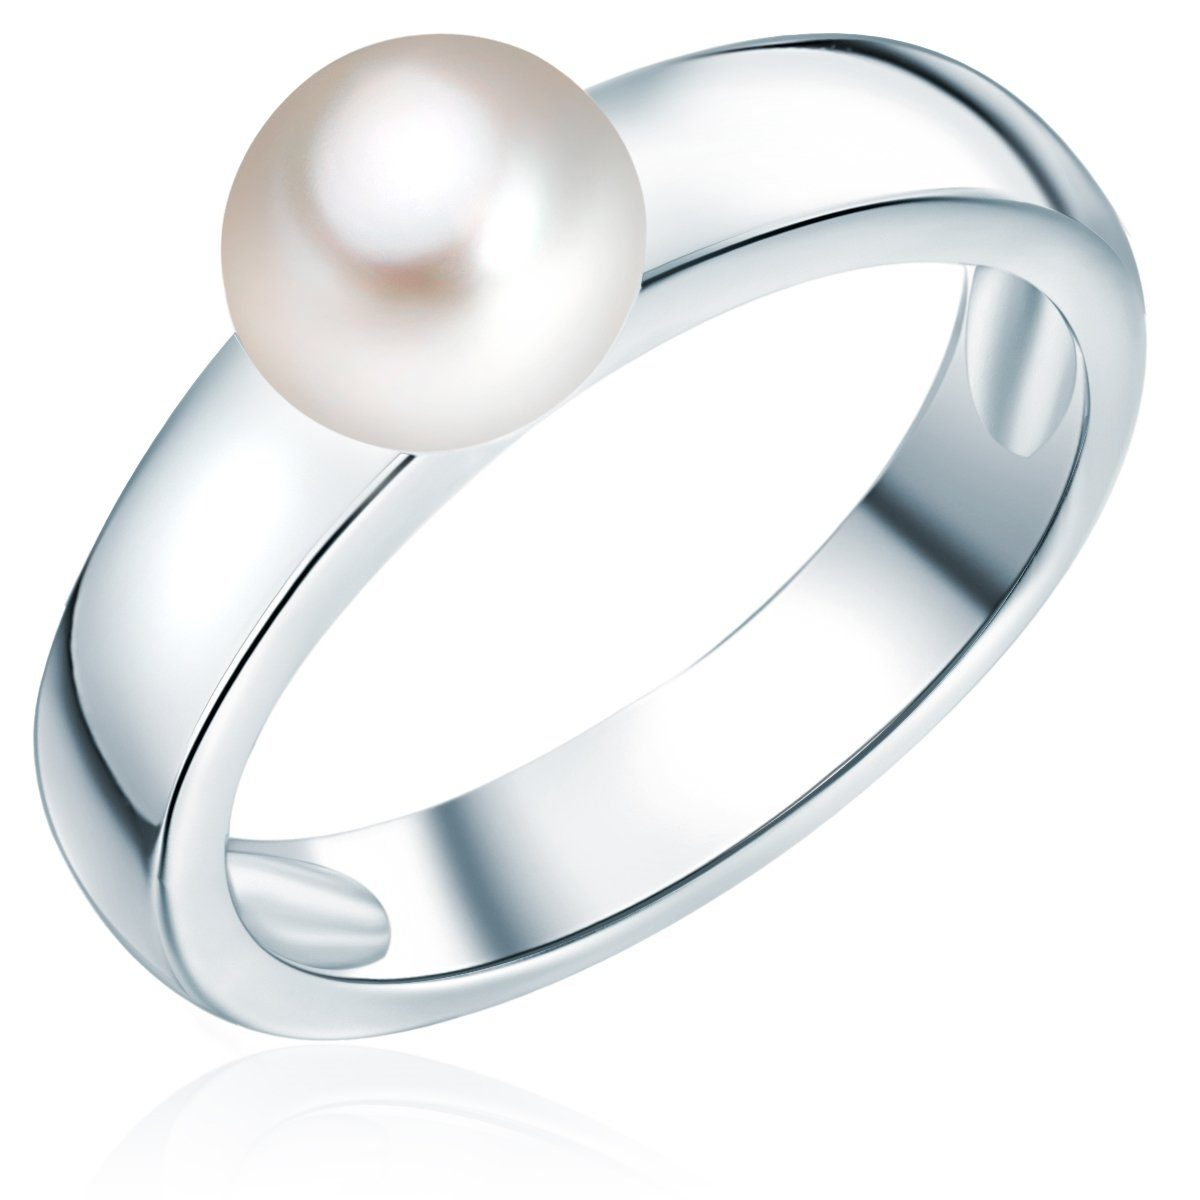 Valero Pearls Perlenring A1506   Schmuck > Ringe > Perlenringe   Valero Pearls